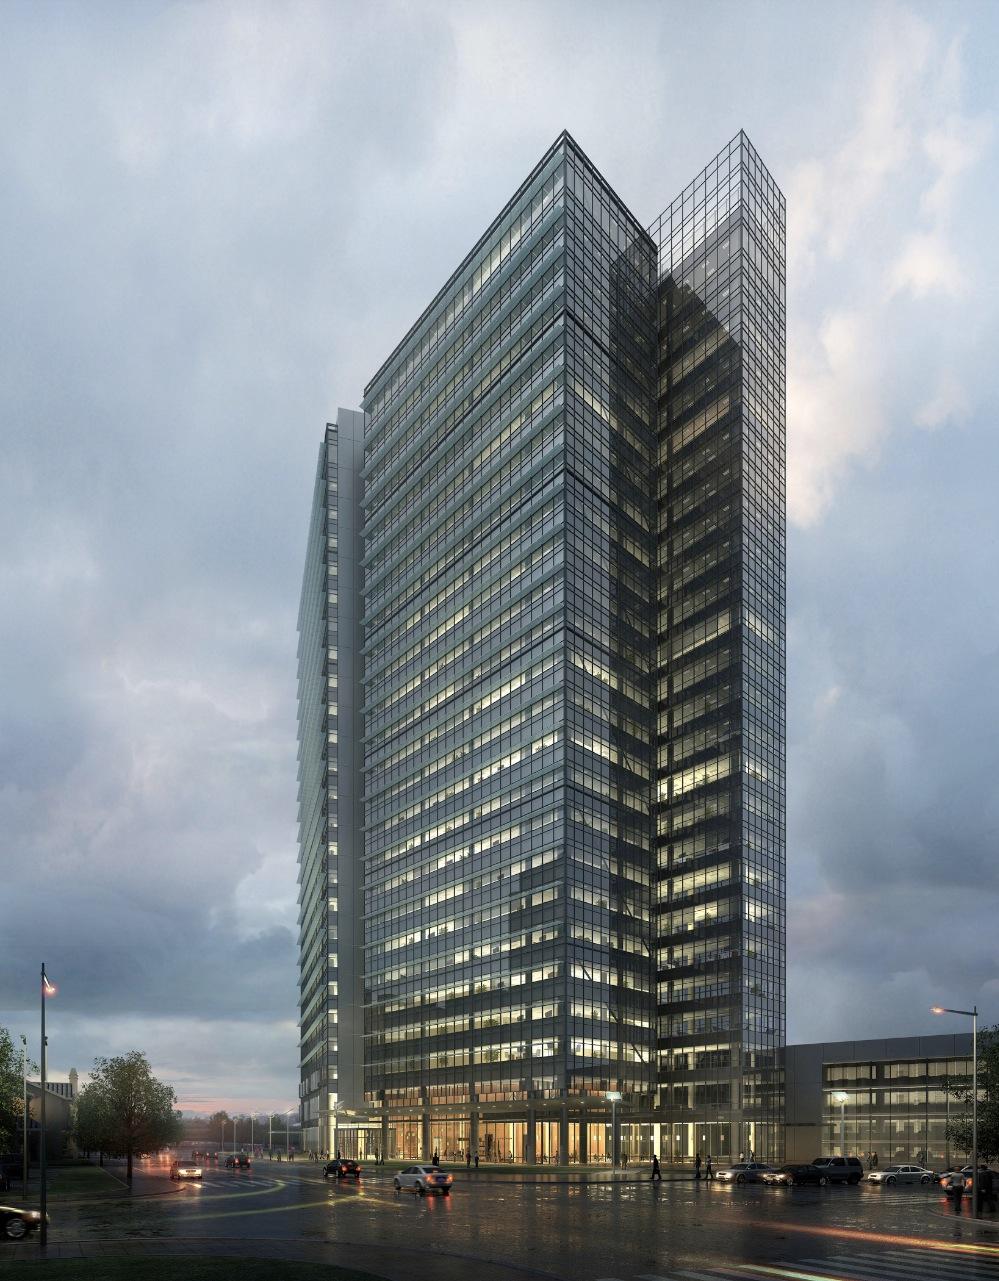 Architecture photography 878689651 finaleveningview hi for Office architecture design